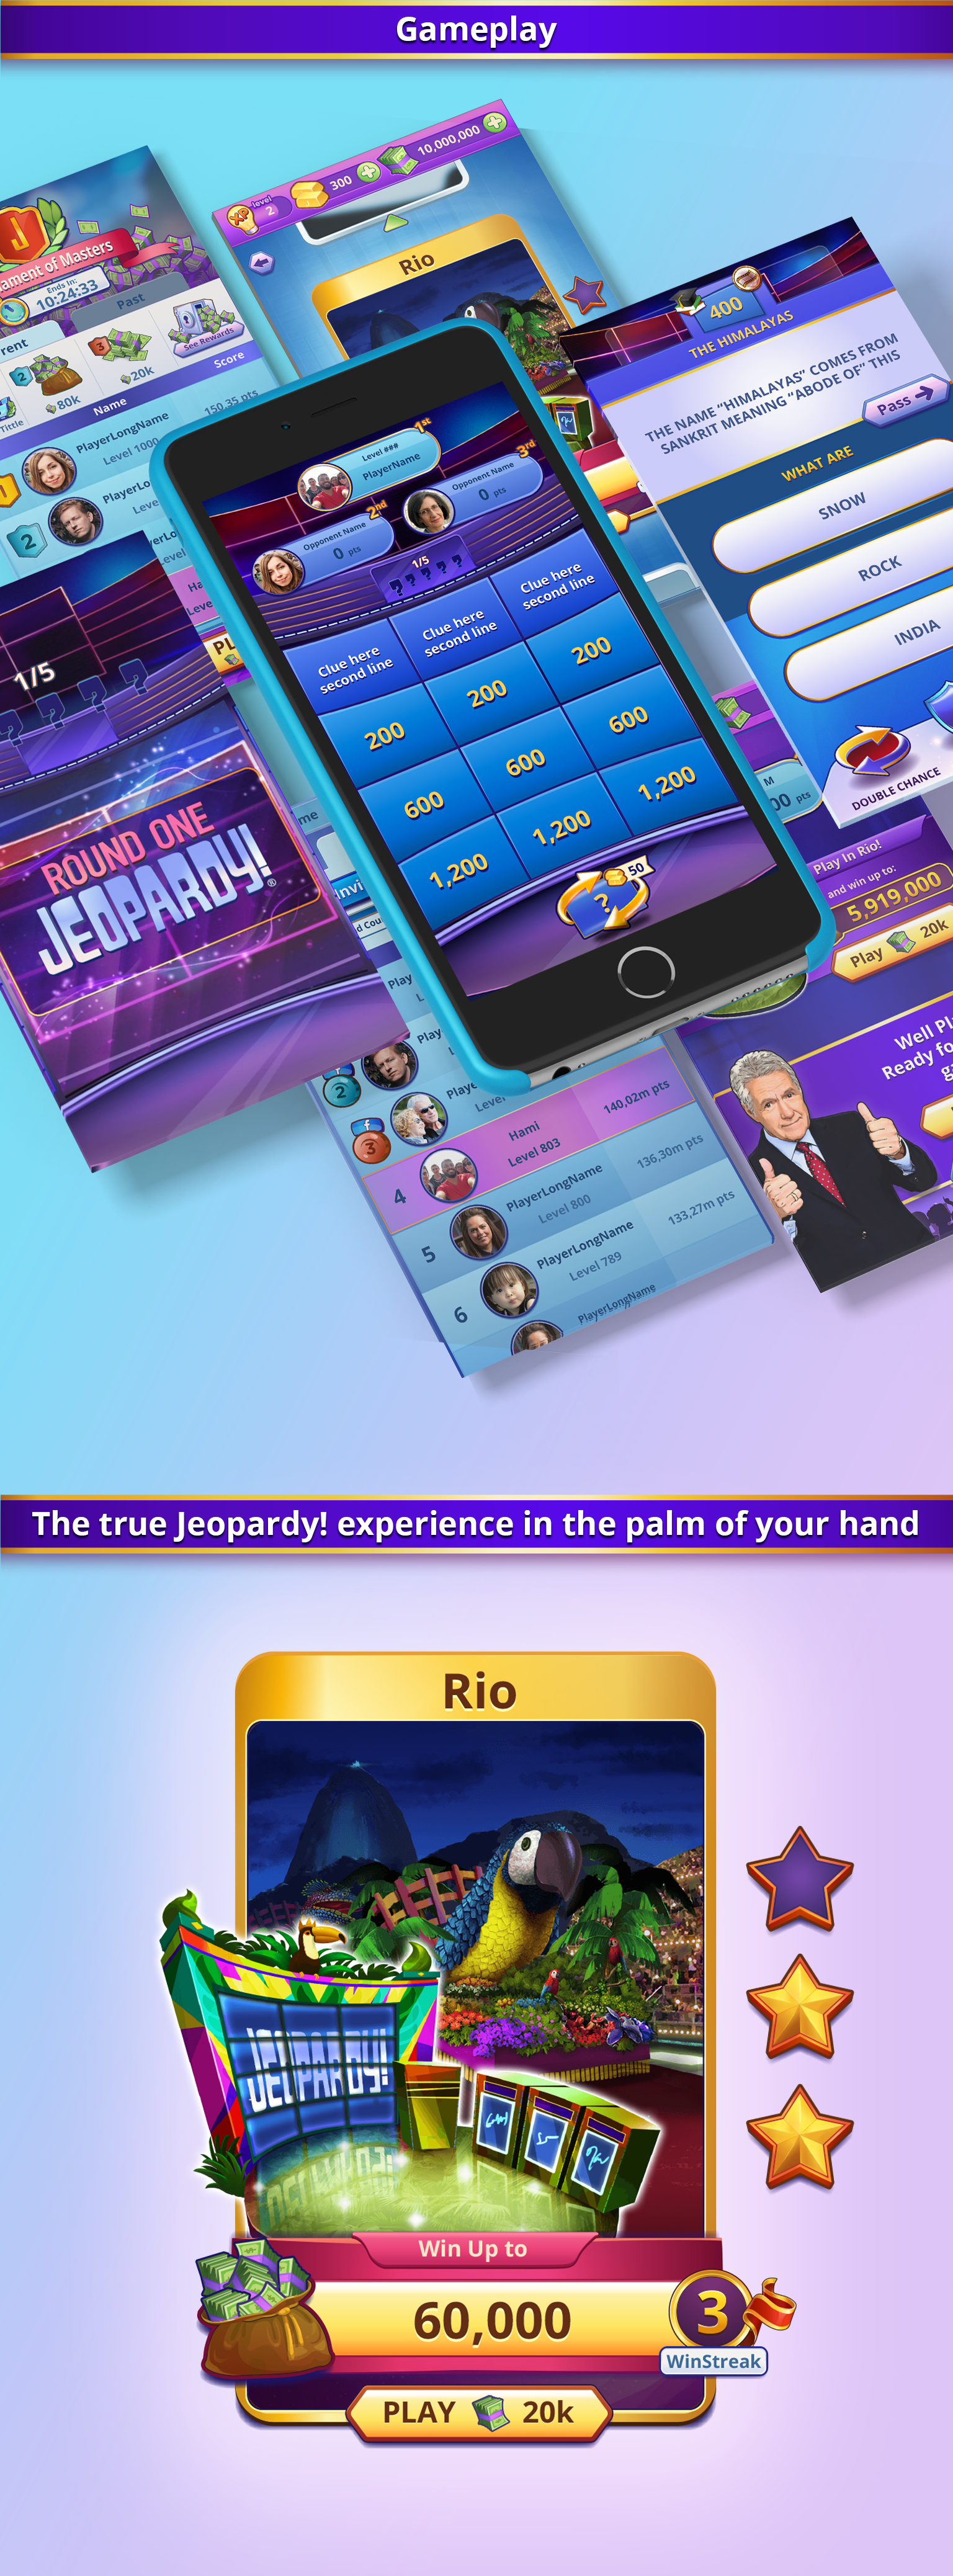 JeopardyWorldTourBehance02.png